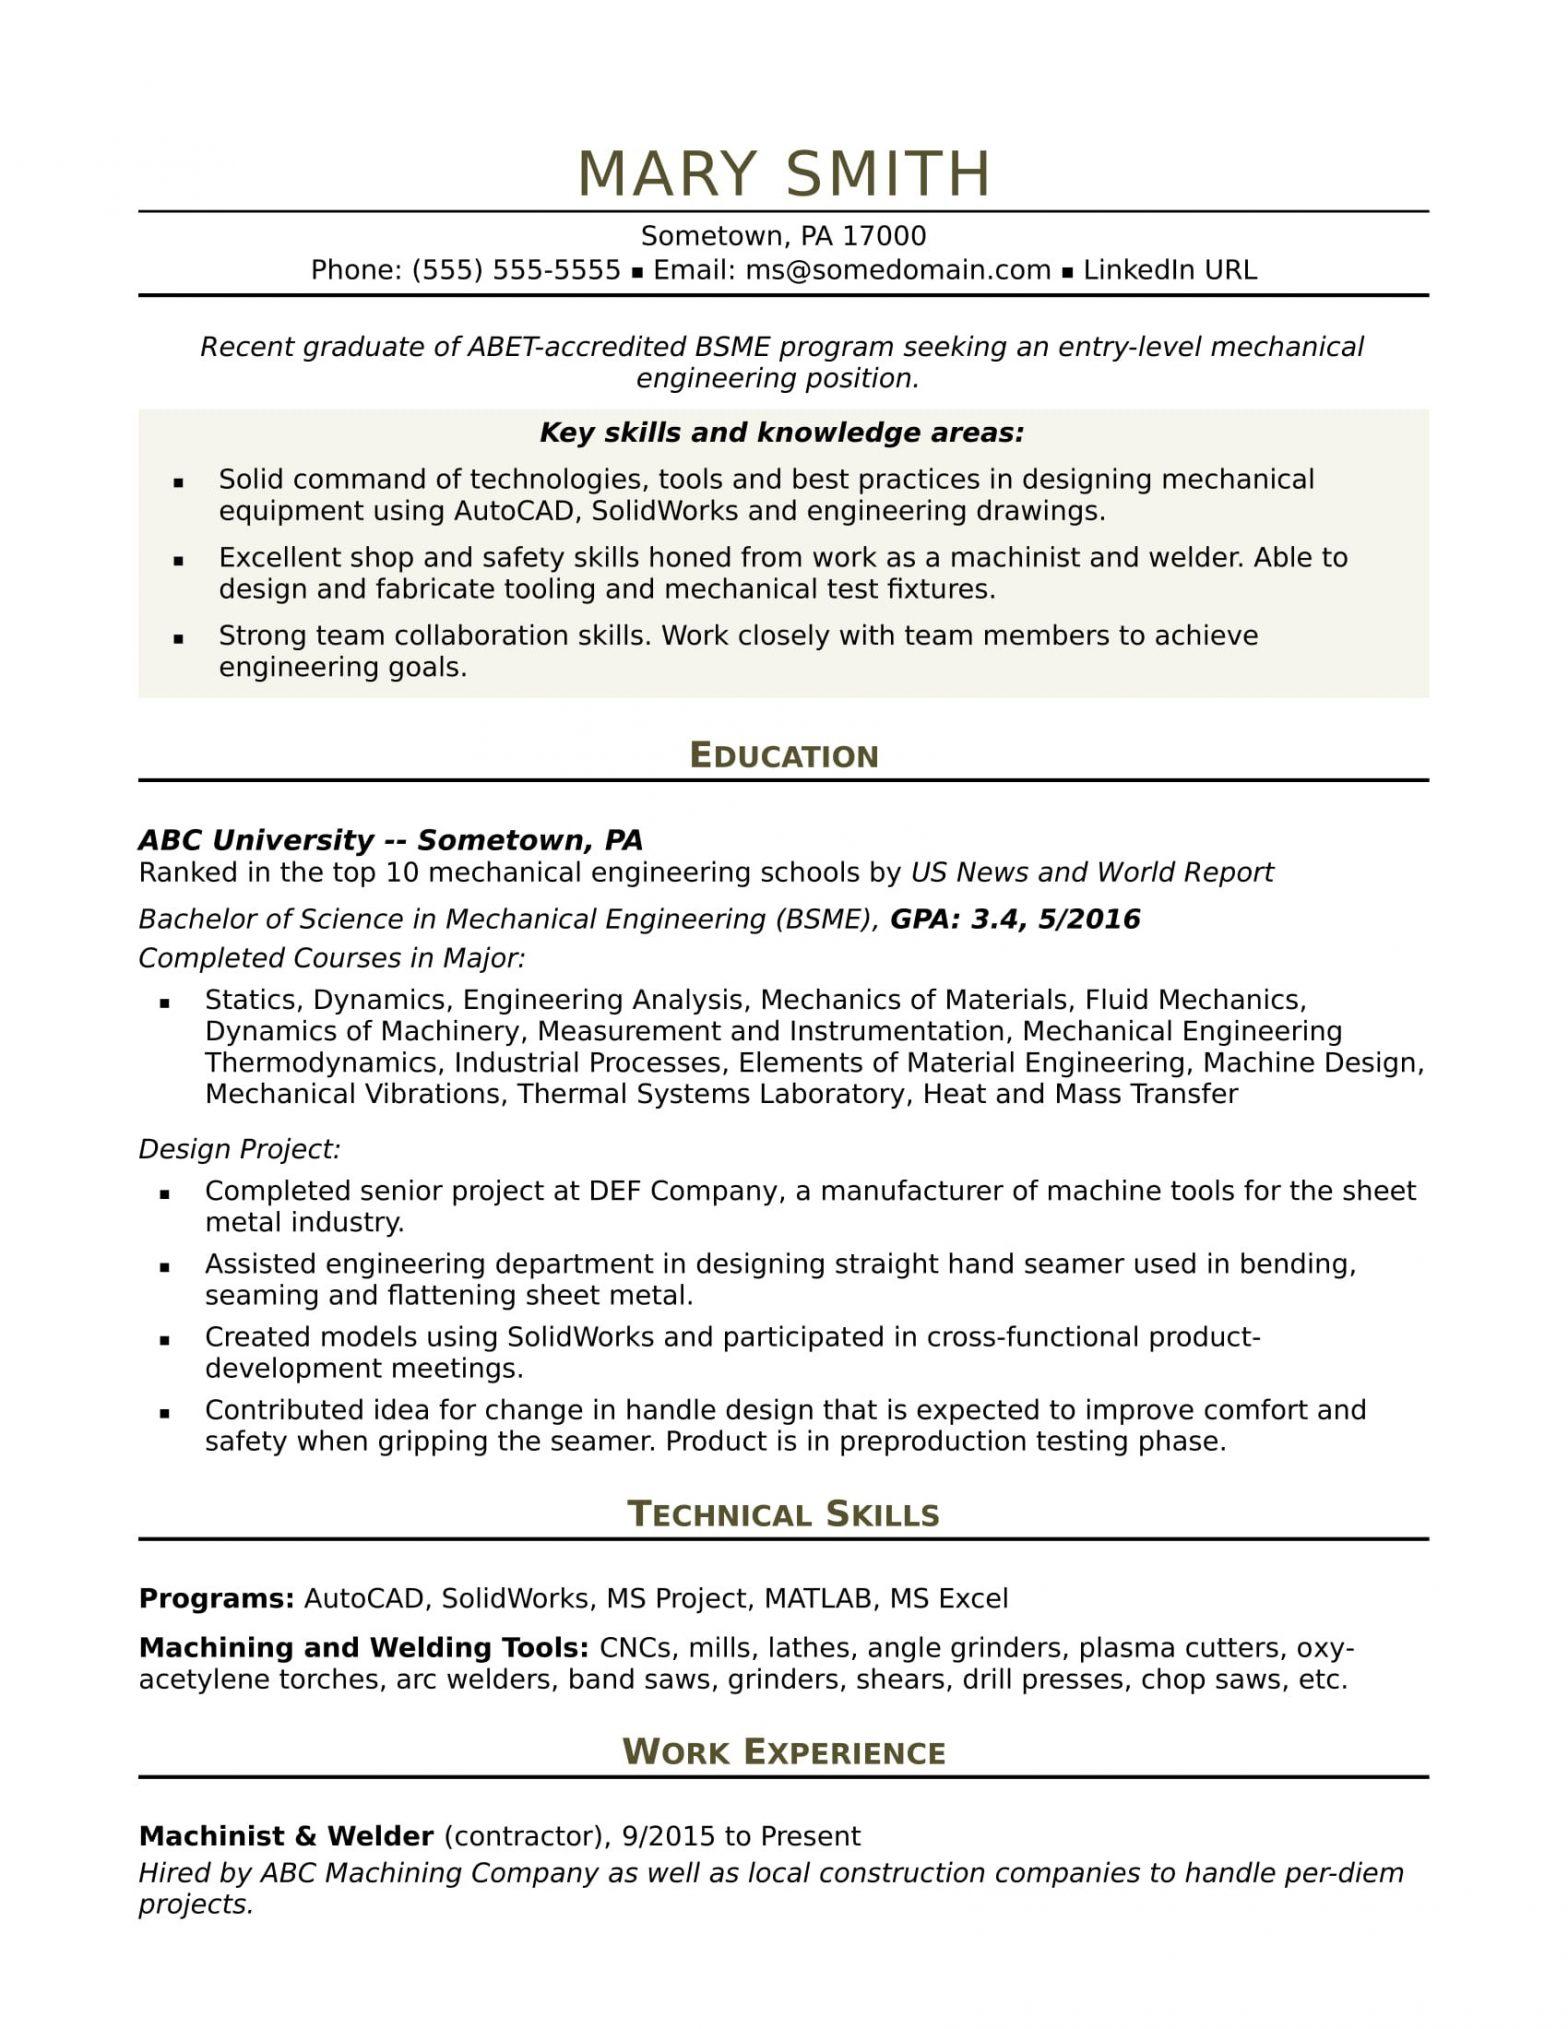 Mechanical Engineering Resume Samples Entry Level Sample Resume for An Entry Level Mechanical Engineer